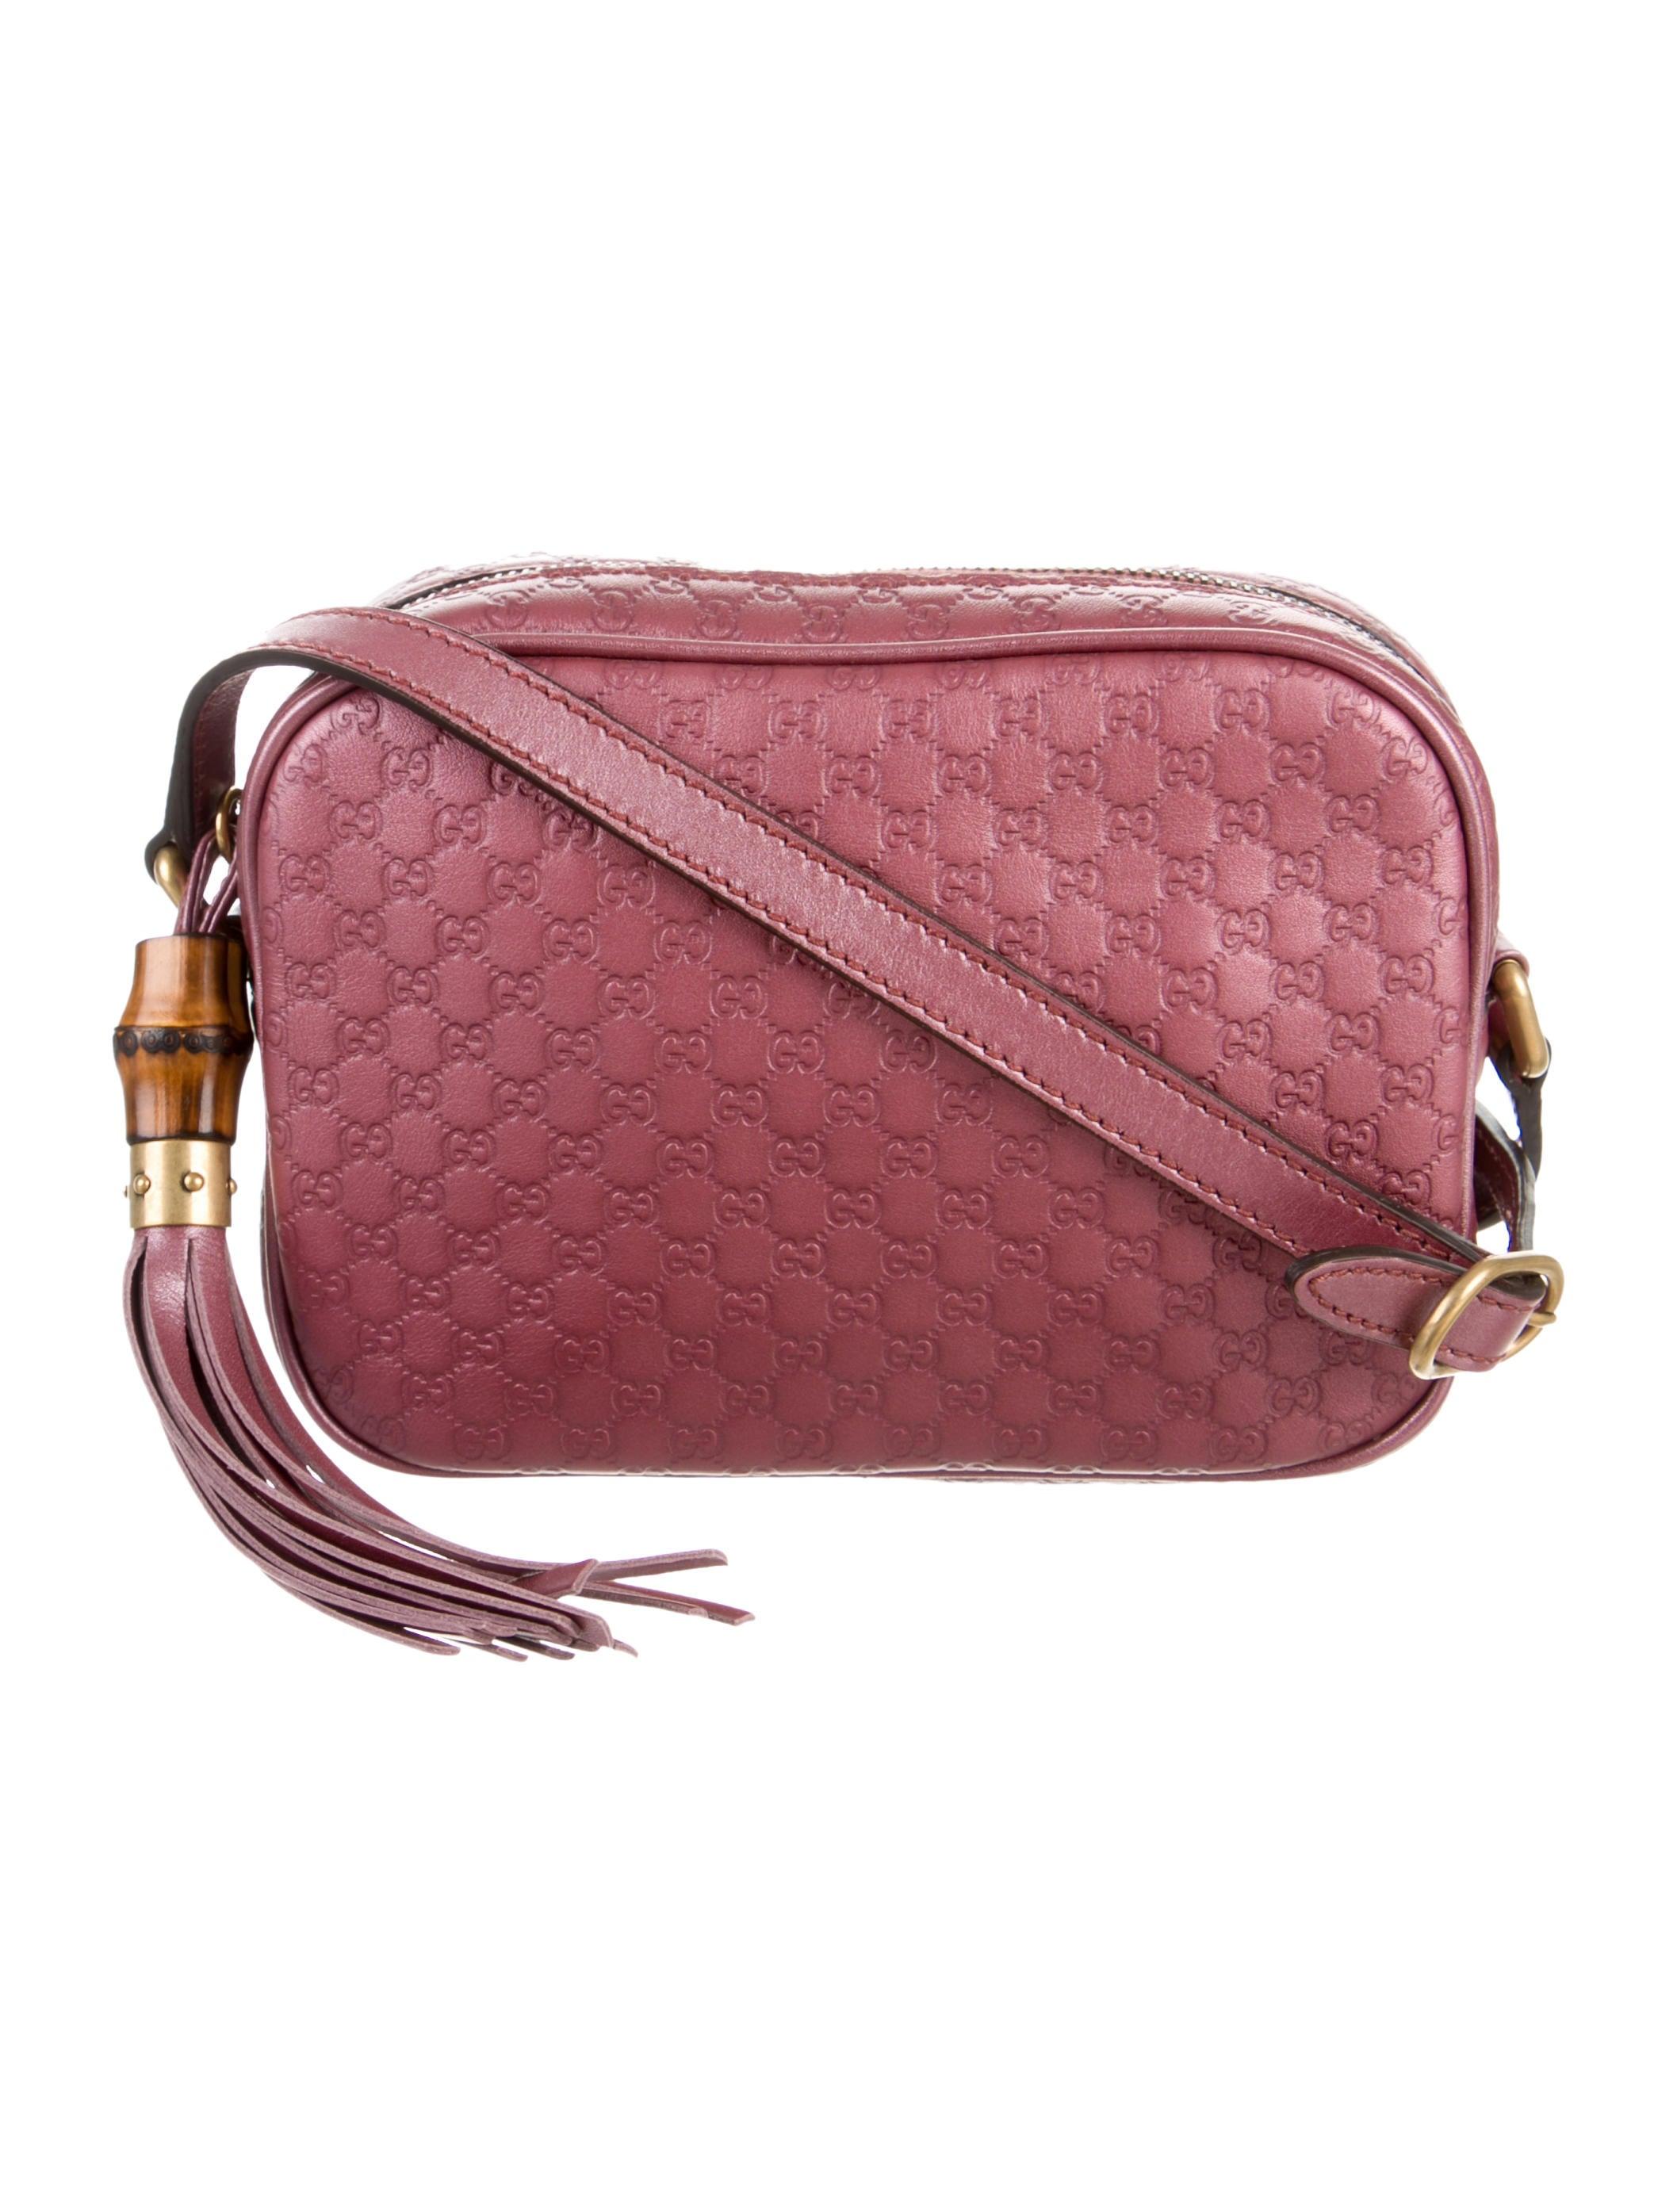 7a28fb1b5a3 Gucci Sunshine Microguccissima Disco Bag w  Tags - Handbags ...